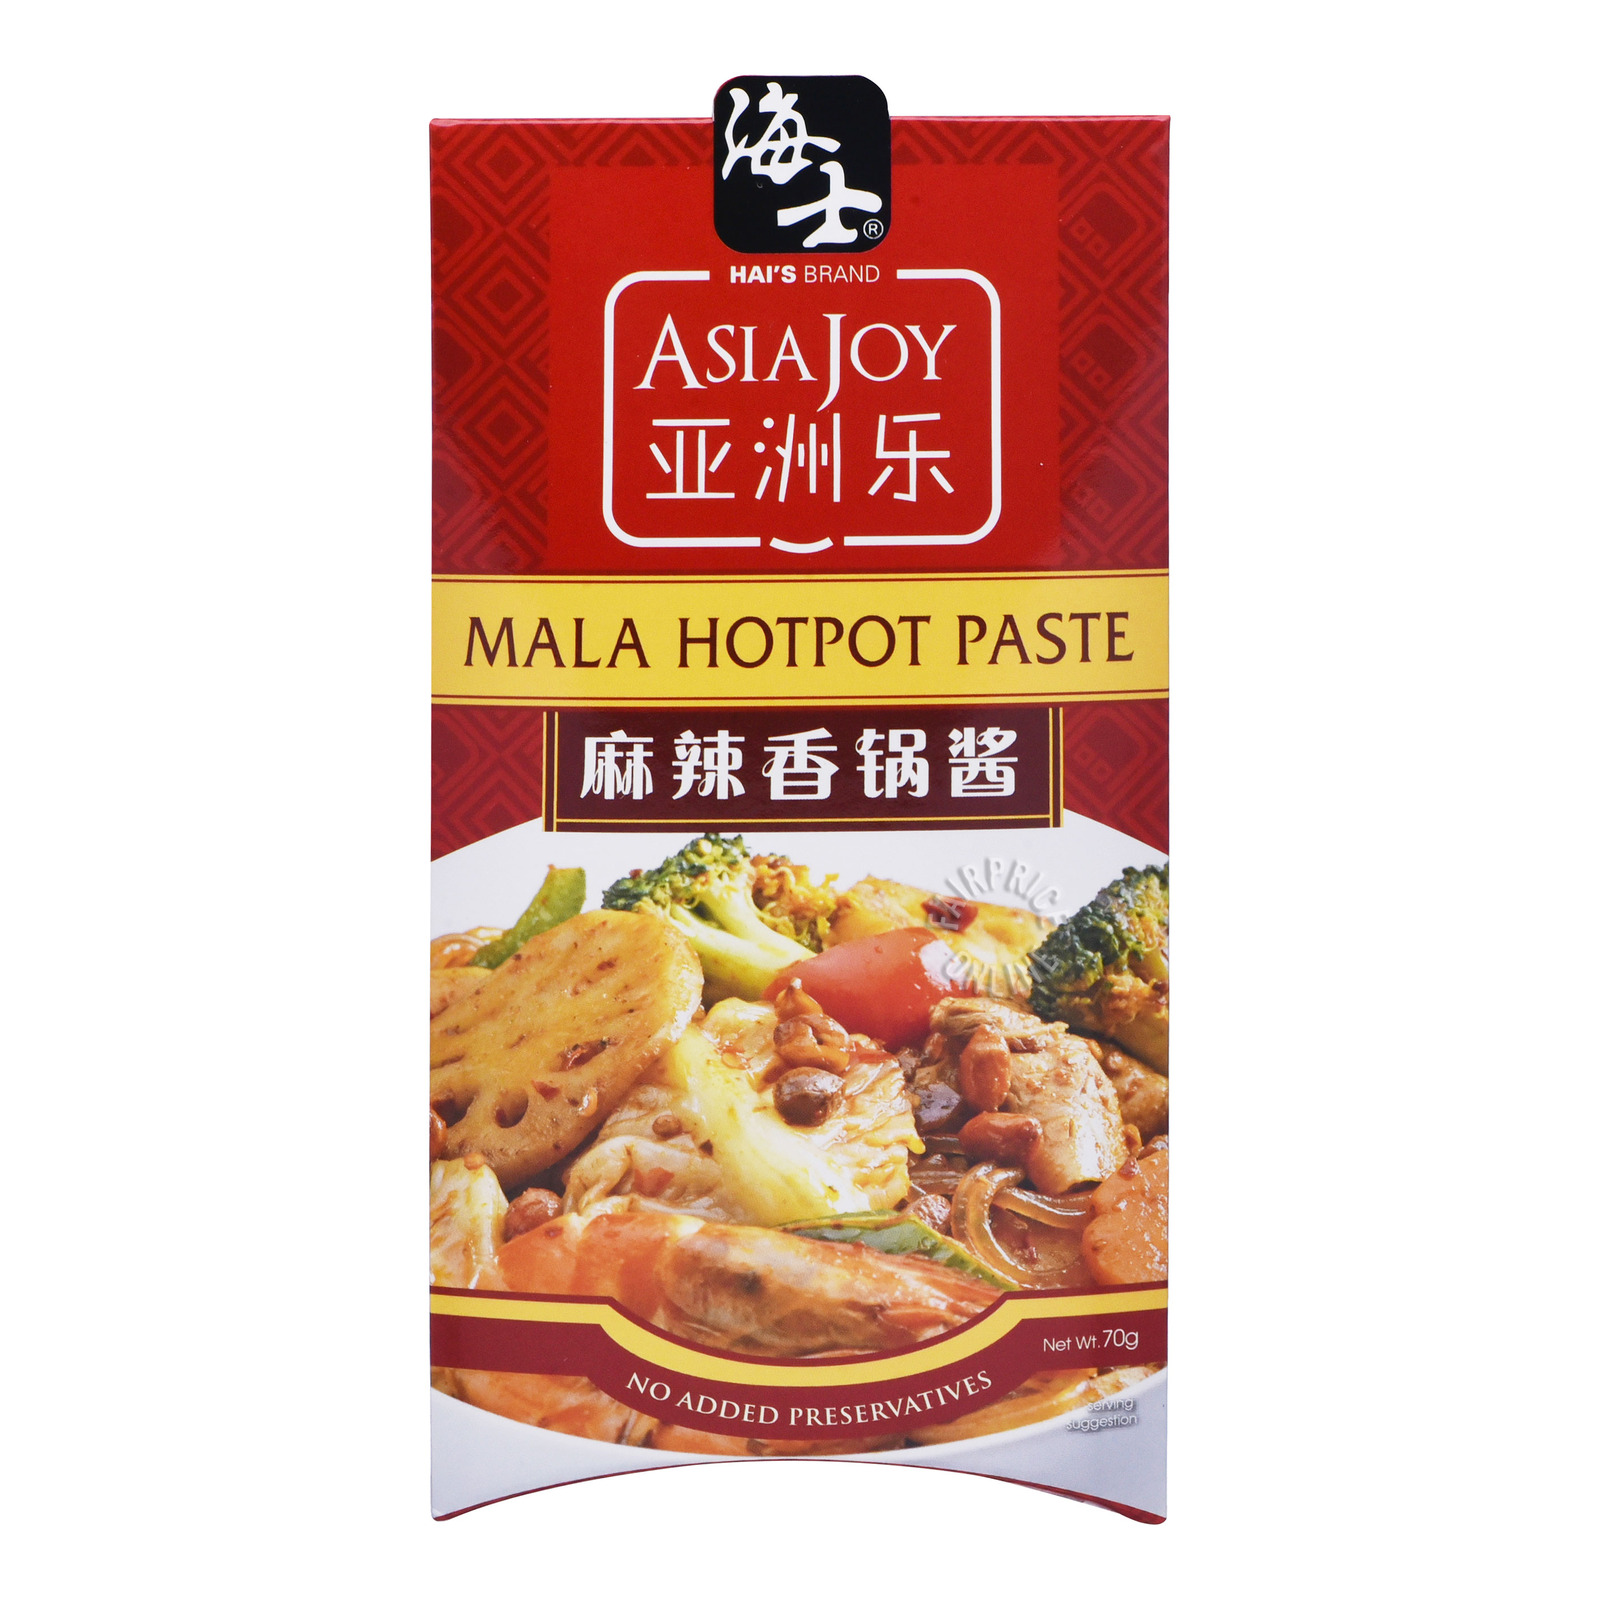 Hai's Brand Asia Joy Sauce - Mala Hotpot